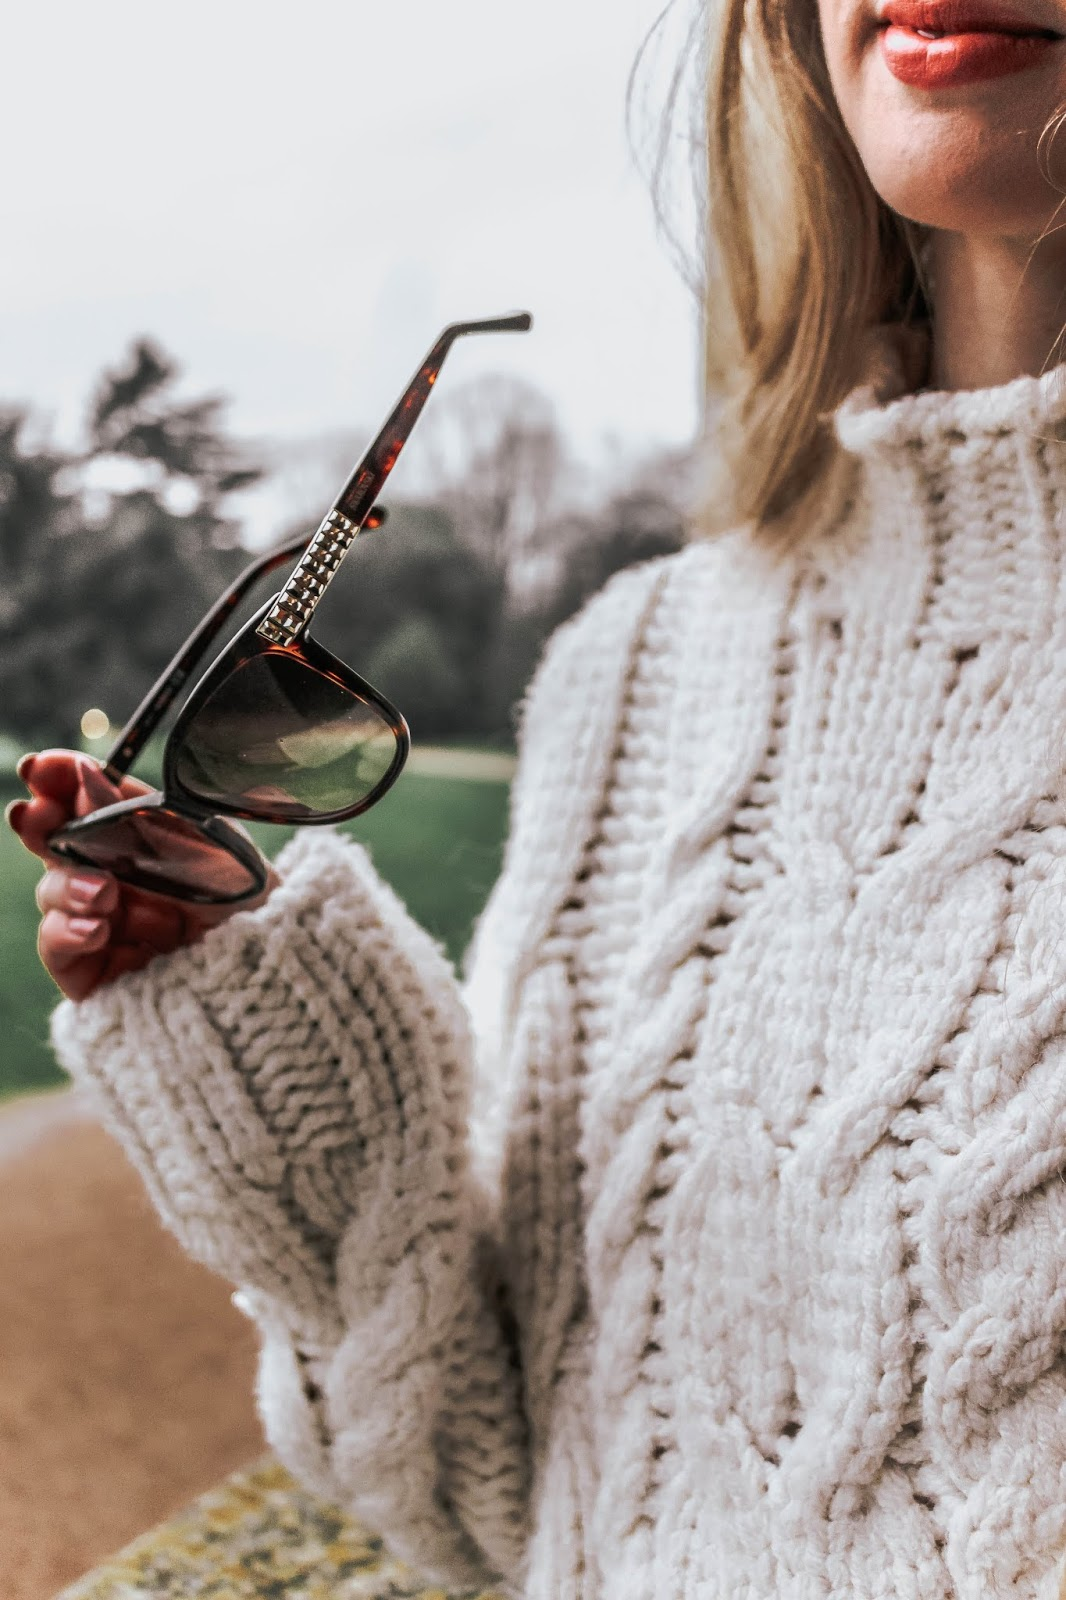 Swarovski Sunglasses at Eyewearbrands Review